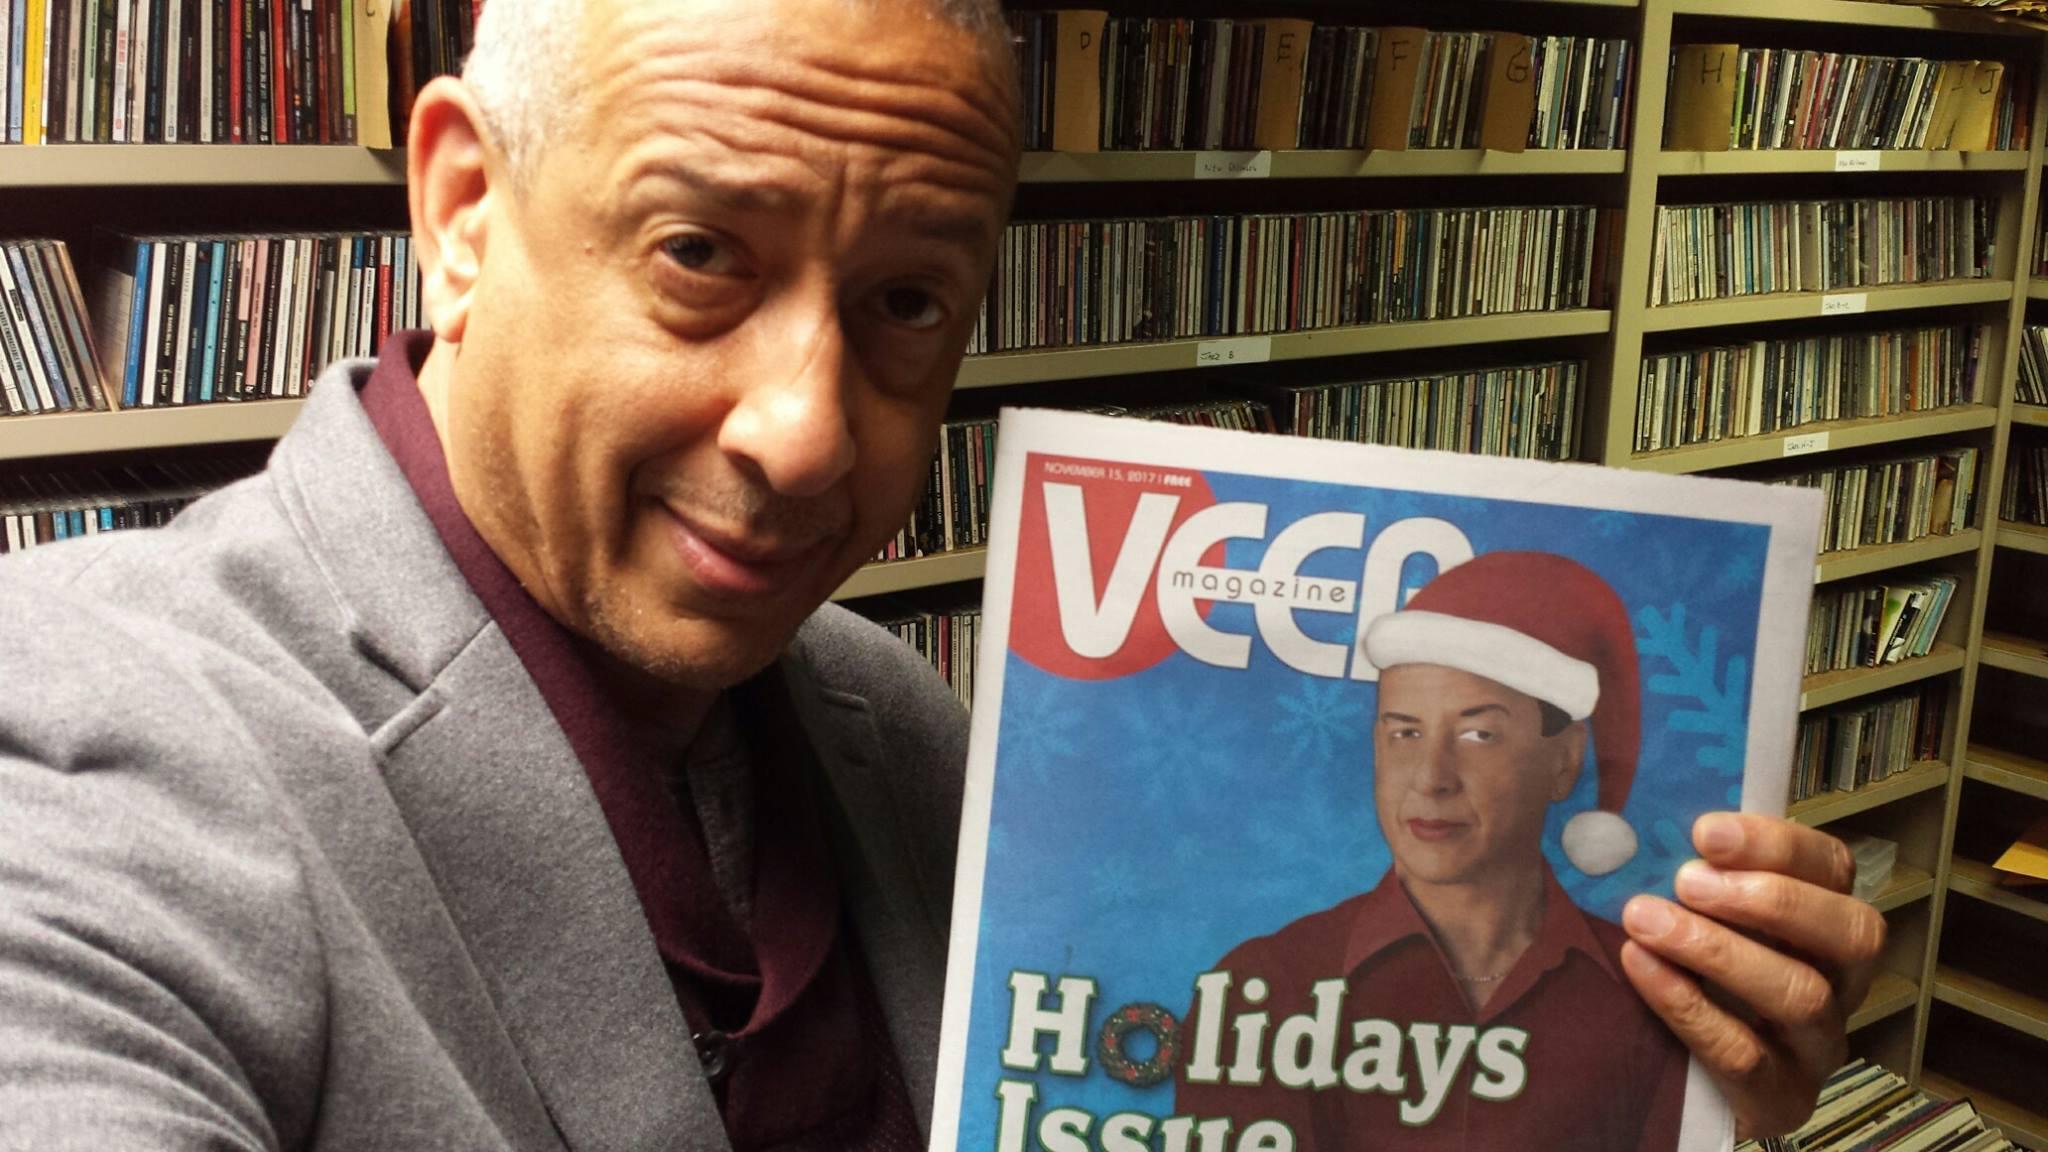 Jae Sinnett with the VEER Magazine 2017 Holidays Issue